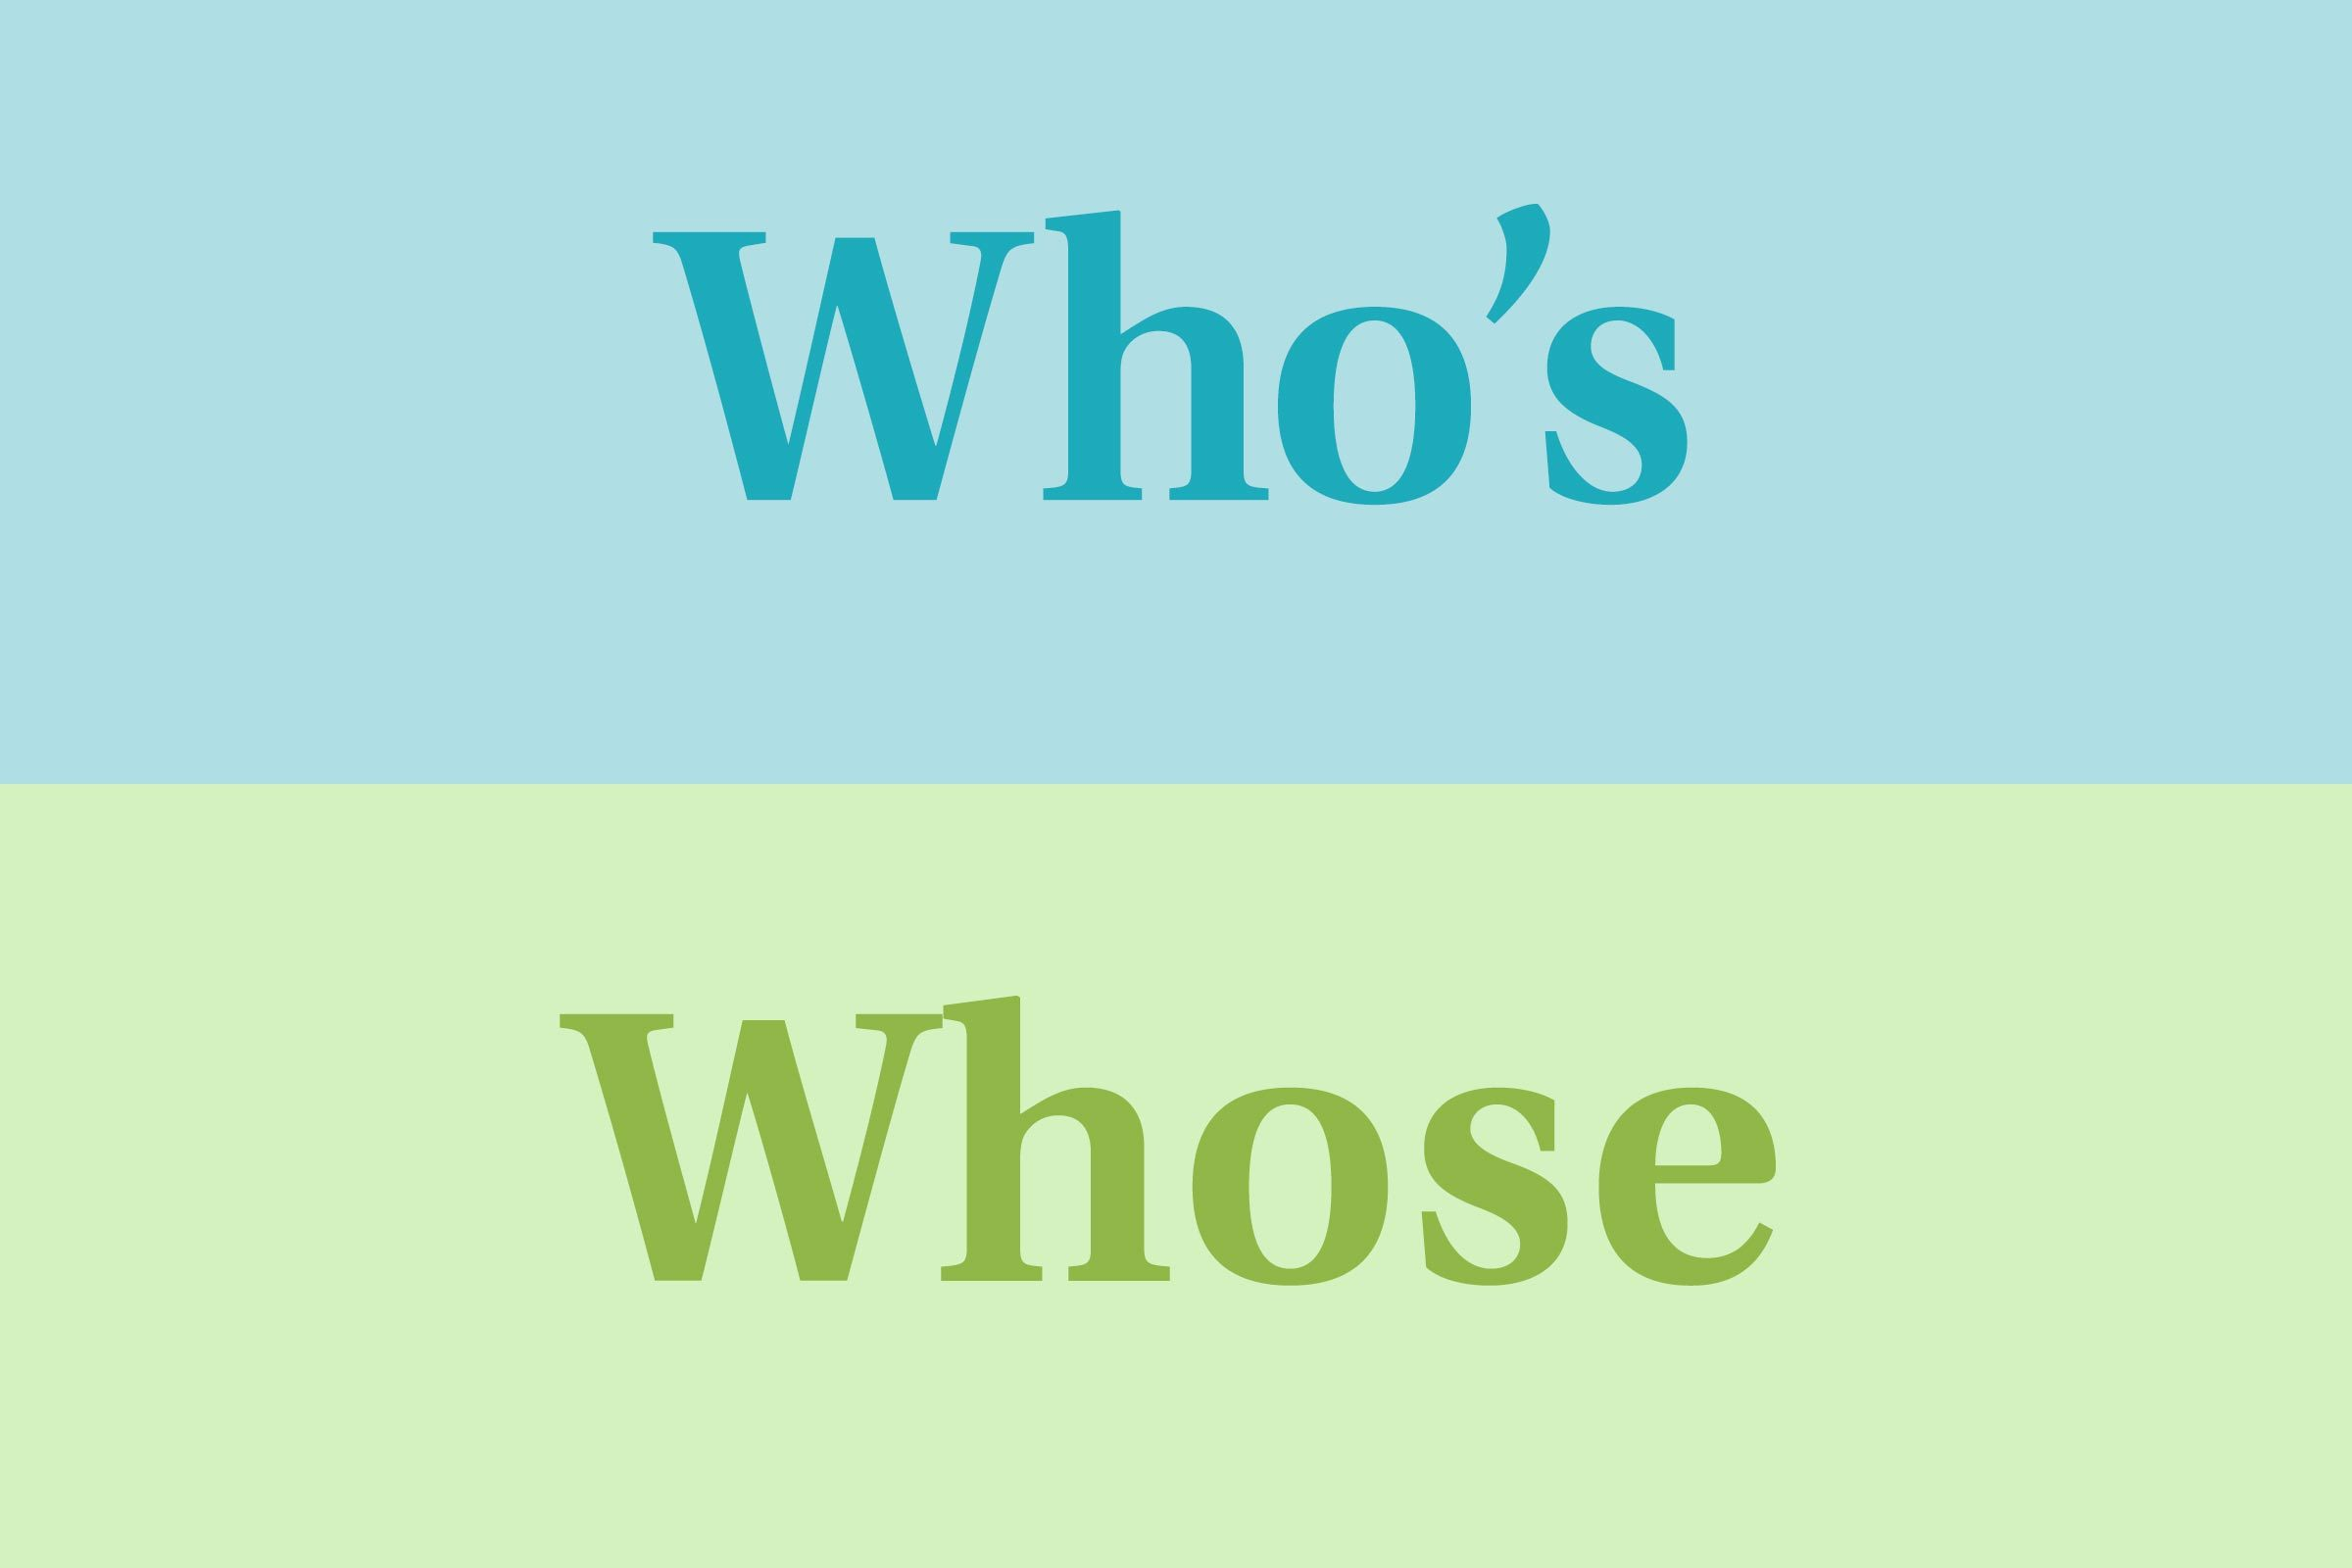 Who's vs. whose